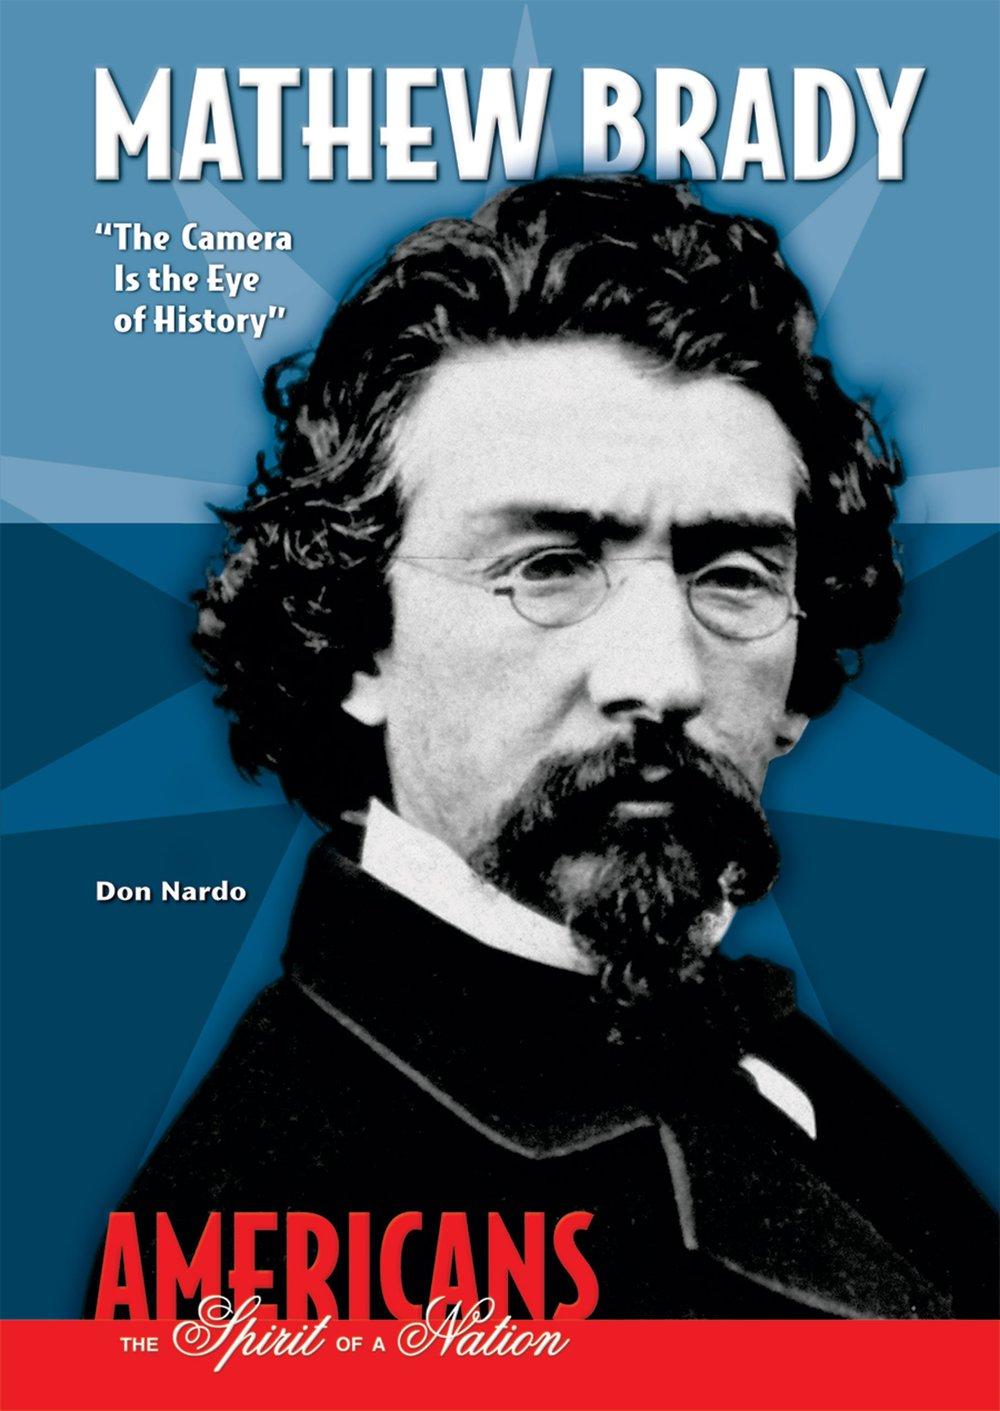 Mathew Brady: The Camera Is the Eye of History (Americans the Spirit of a Nation): Don Nardo: 9780766030237: Amazon.com: Books